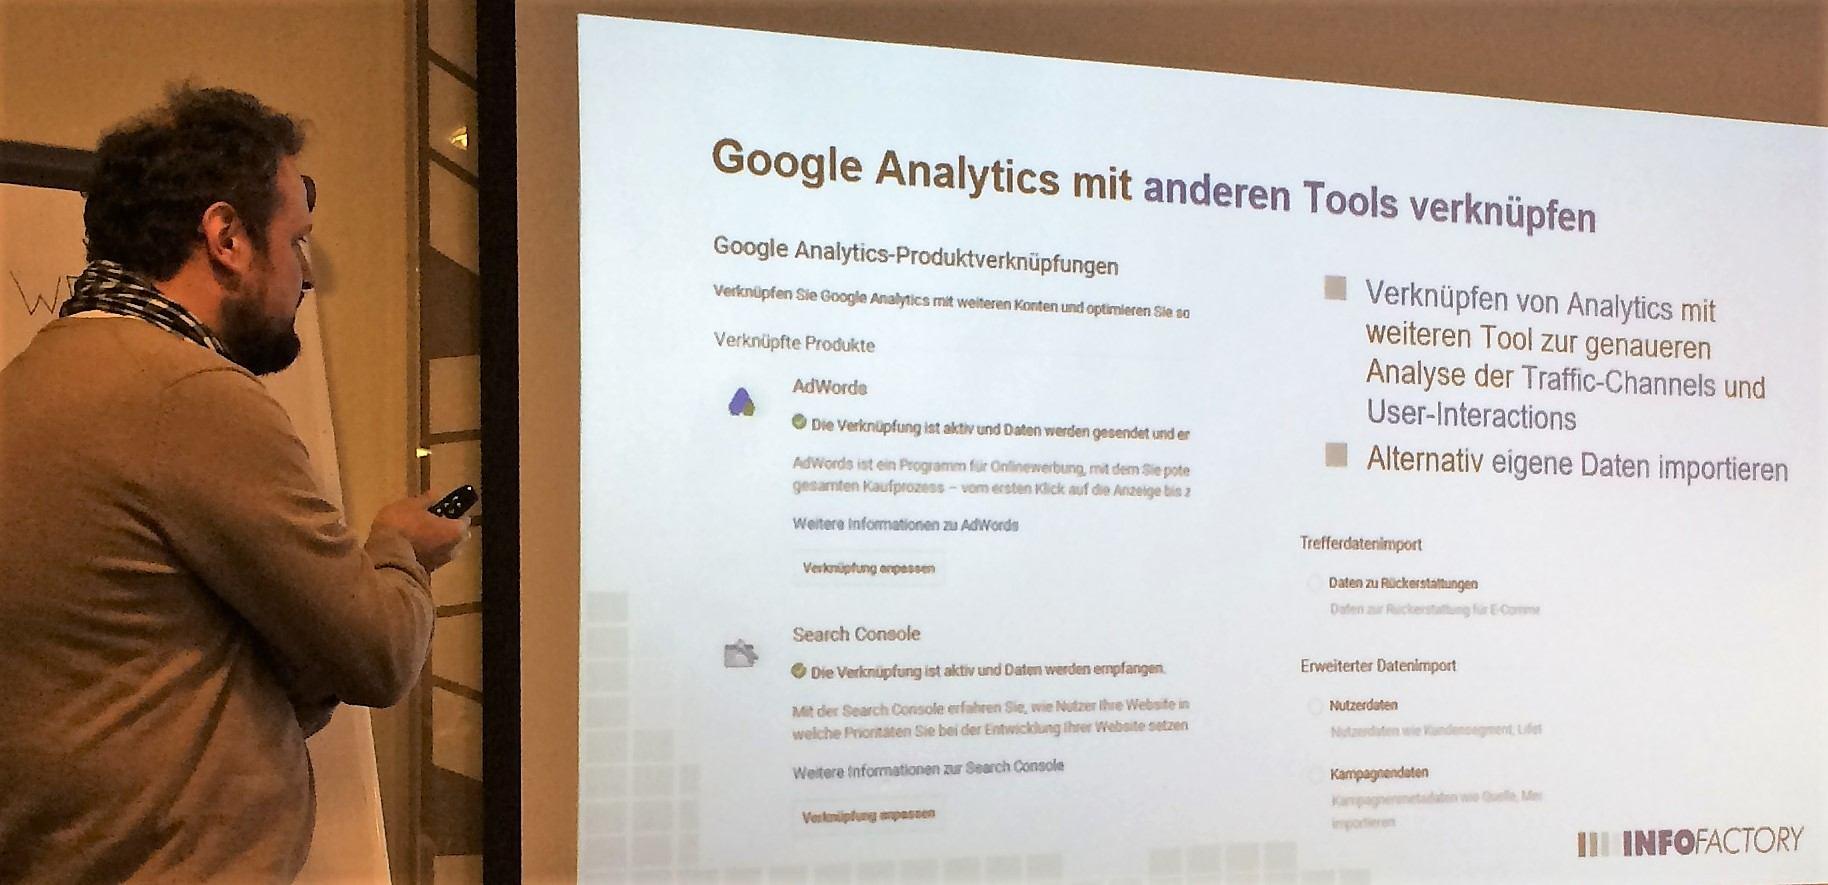 Google AdWords und Search Console verknüpfen